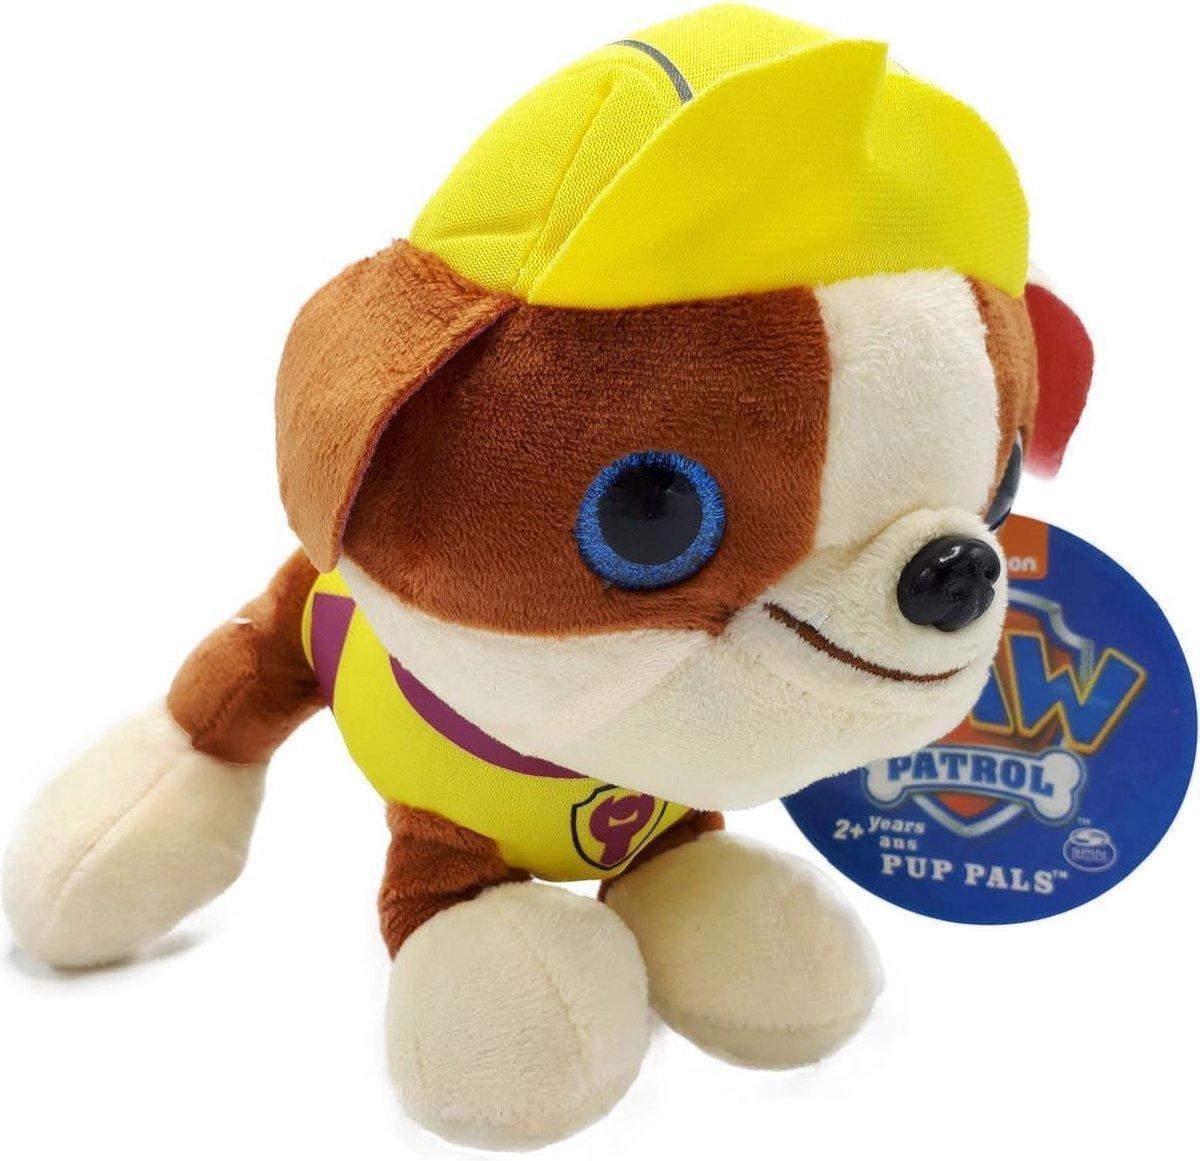 PAW Patrols - Pup Pals Rubble - Pluche Knuffel 26 cm | Paw Patrol & Friends | Chase - Rubble - Marshall - Skye - Zuma - Rocky - Ella - Tuck | Nickelodeon | Speelgoed